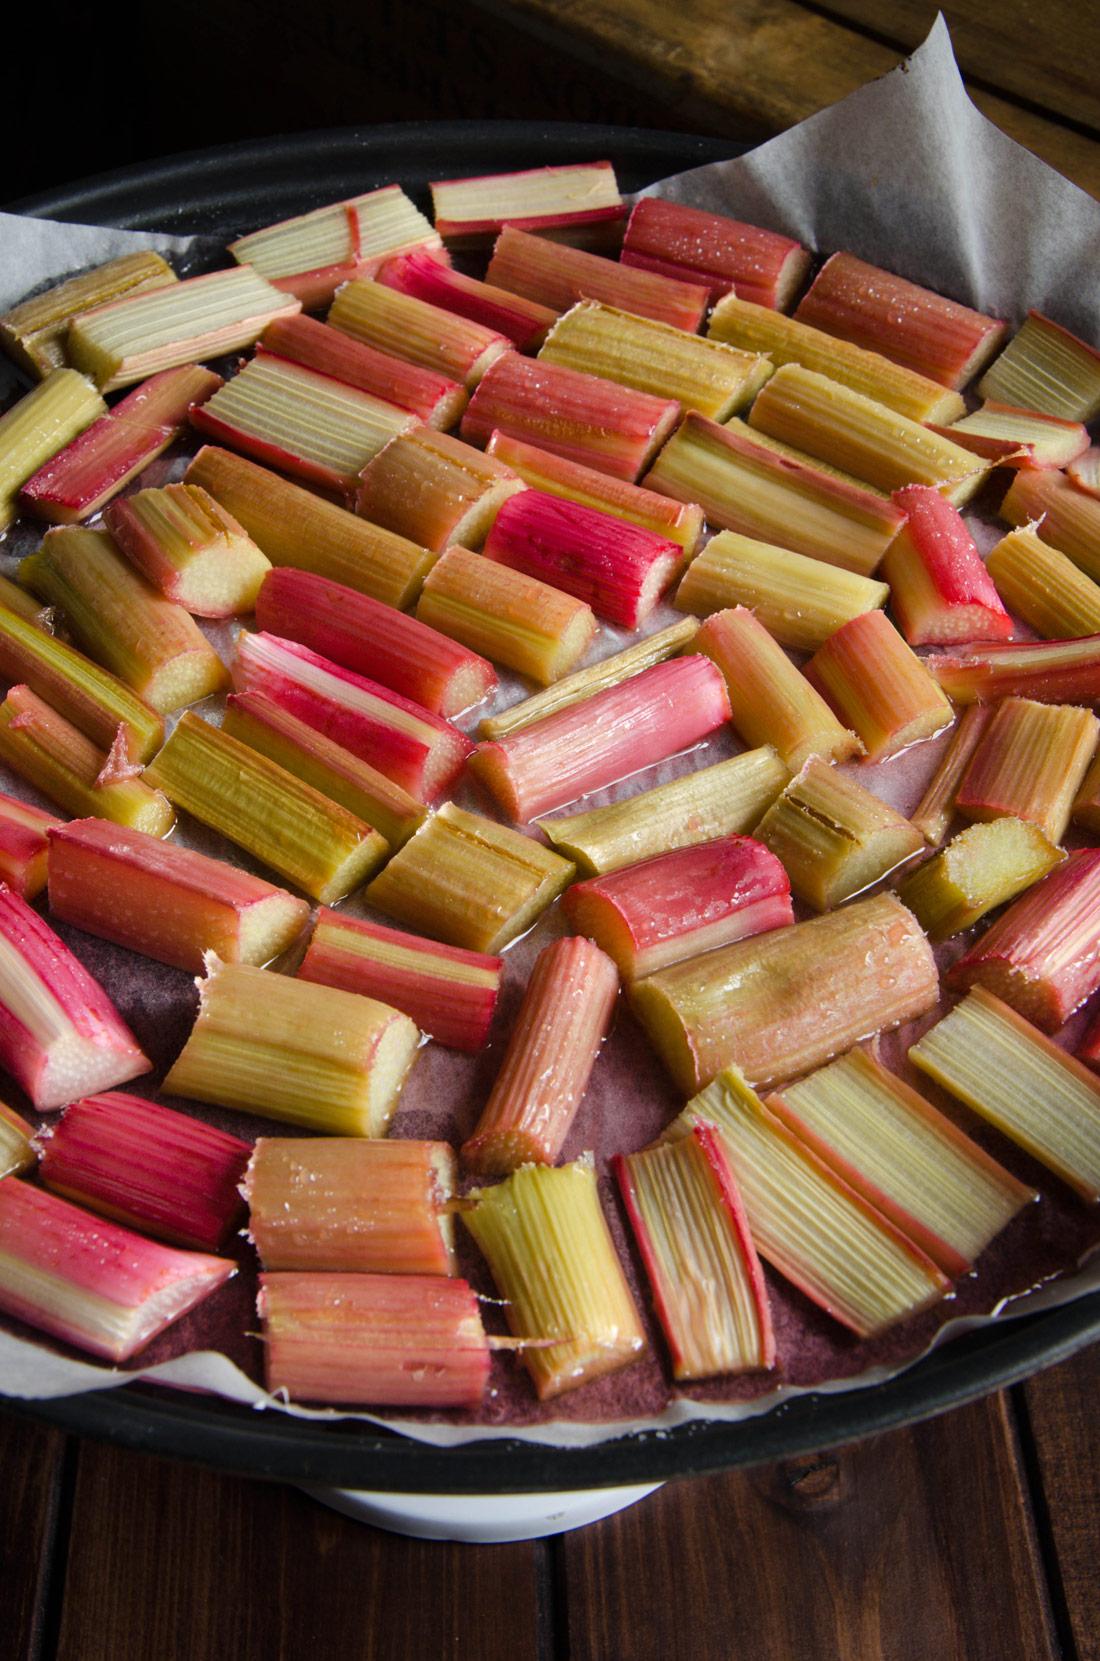 Tronçons de rhubarbe